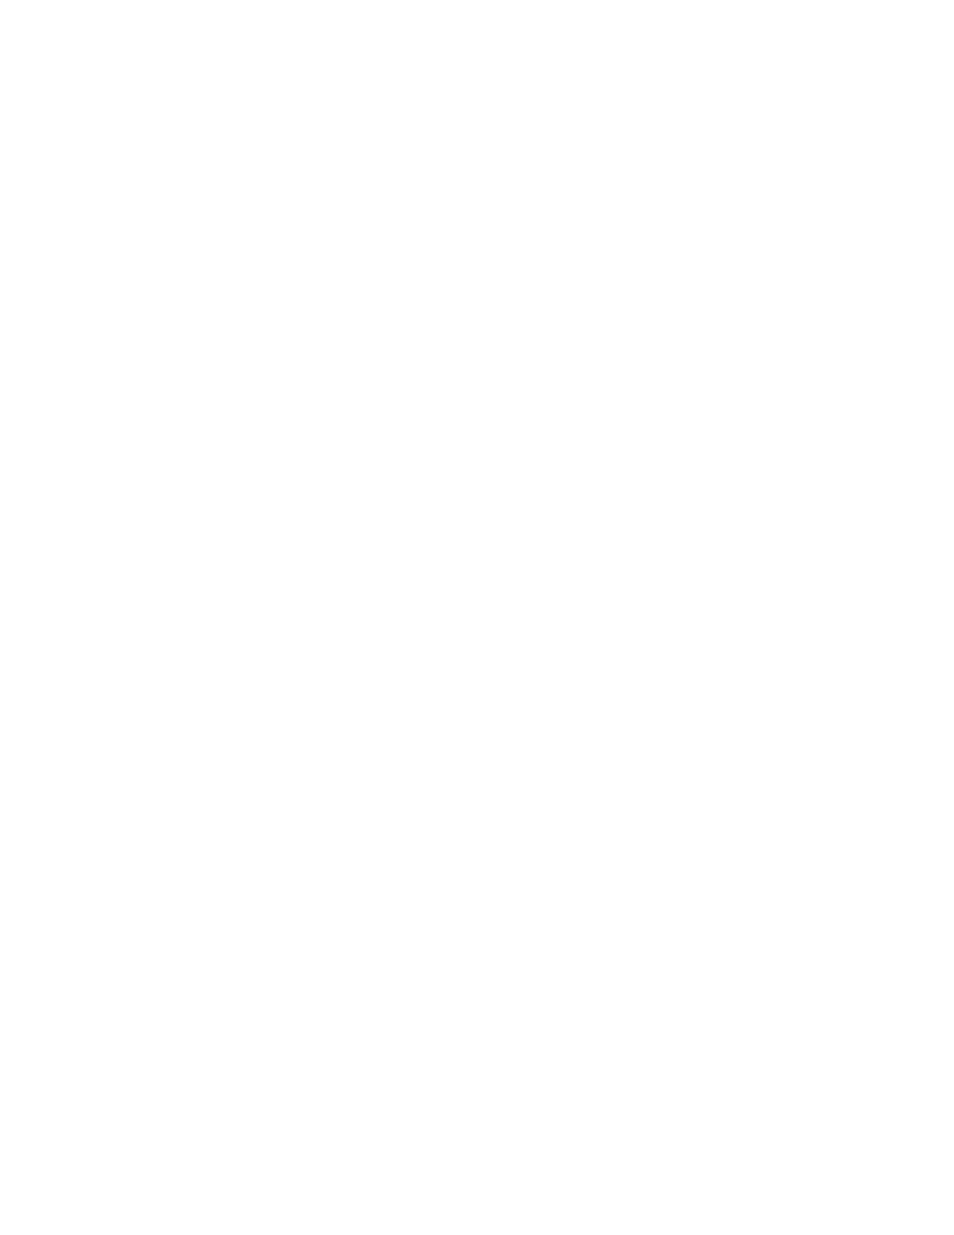 Ecmp   Alcatel-Lucent 7750 SR OS User Manual   Page 88 / 482